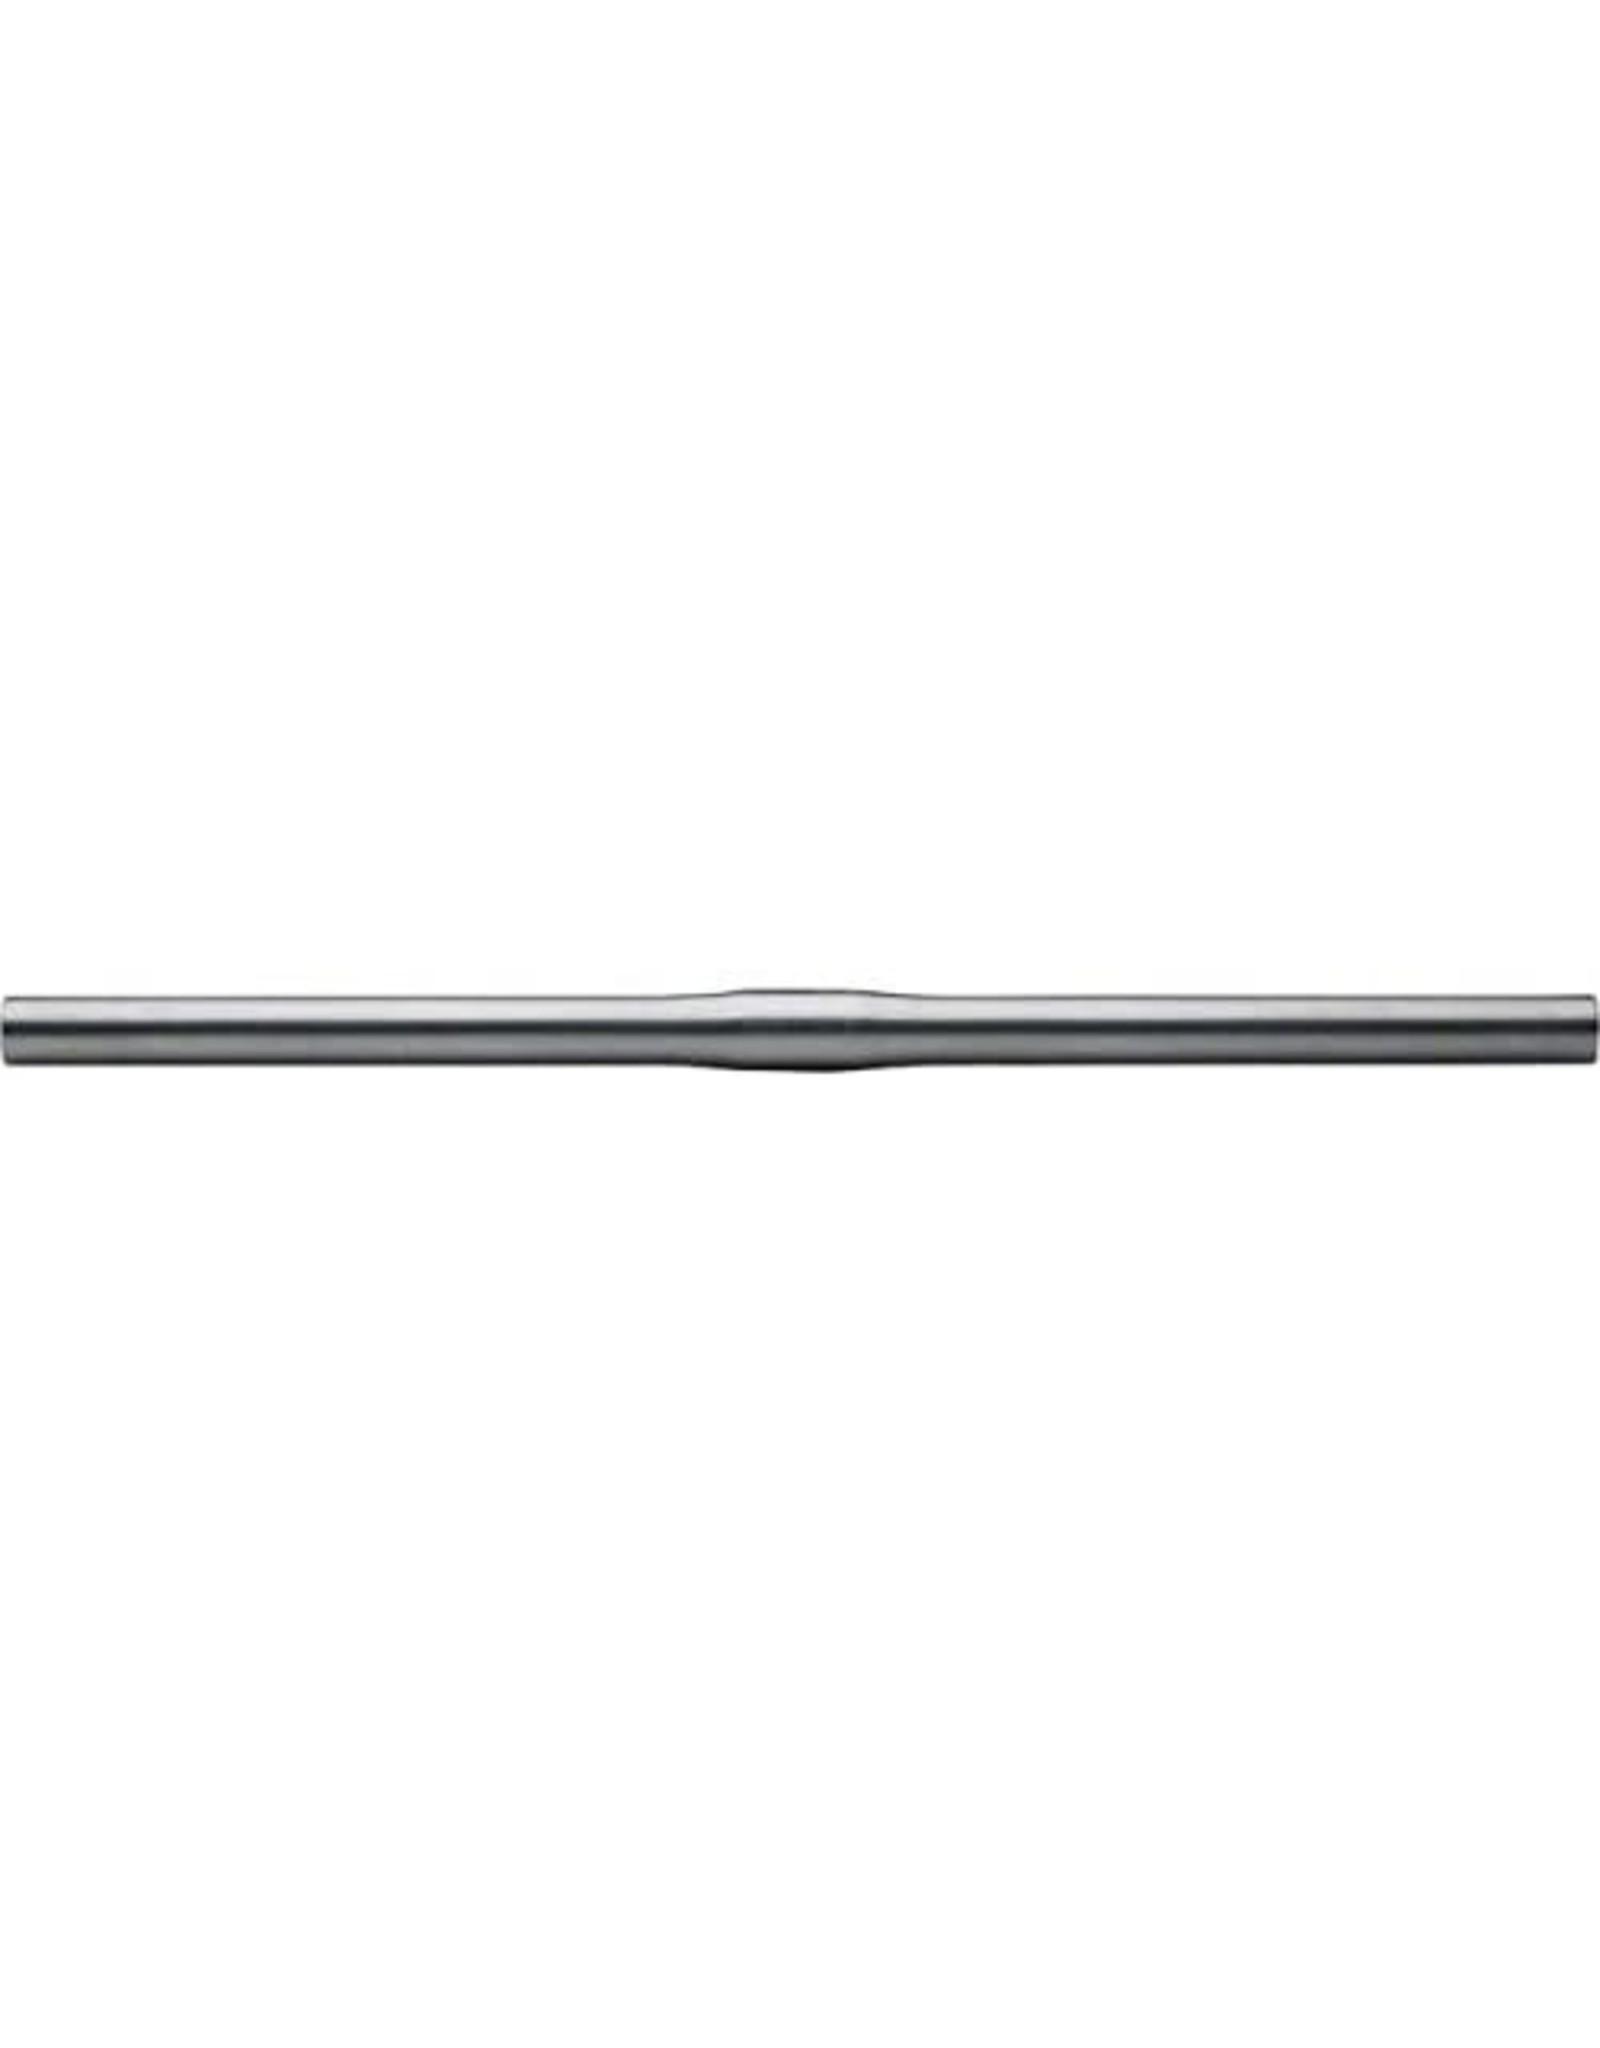 Nitto B2500 Straight Handlebar: 25.4mm/Silver